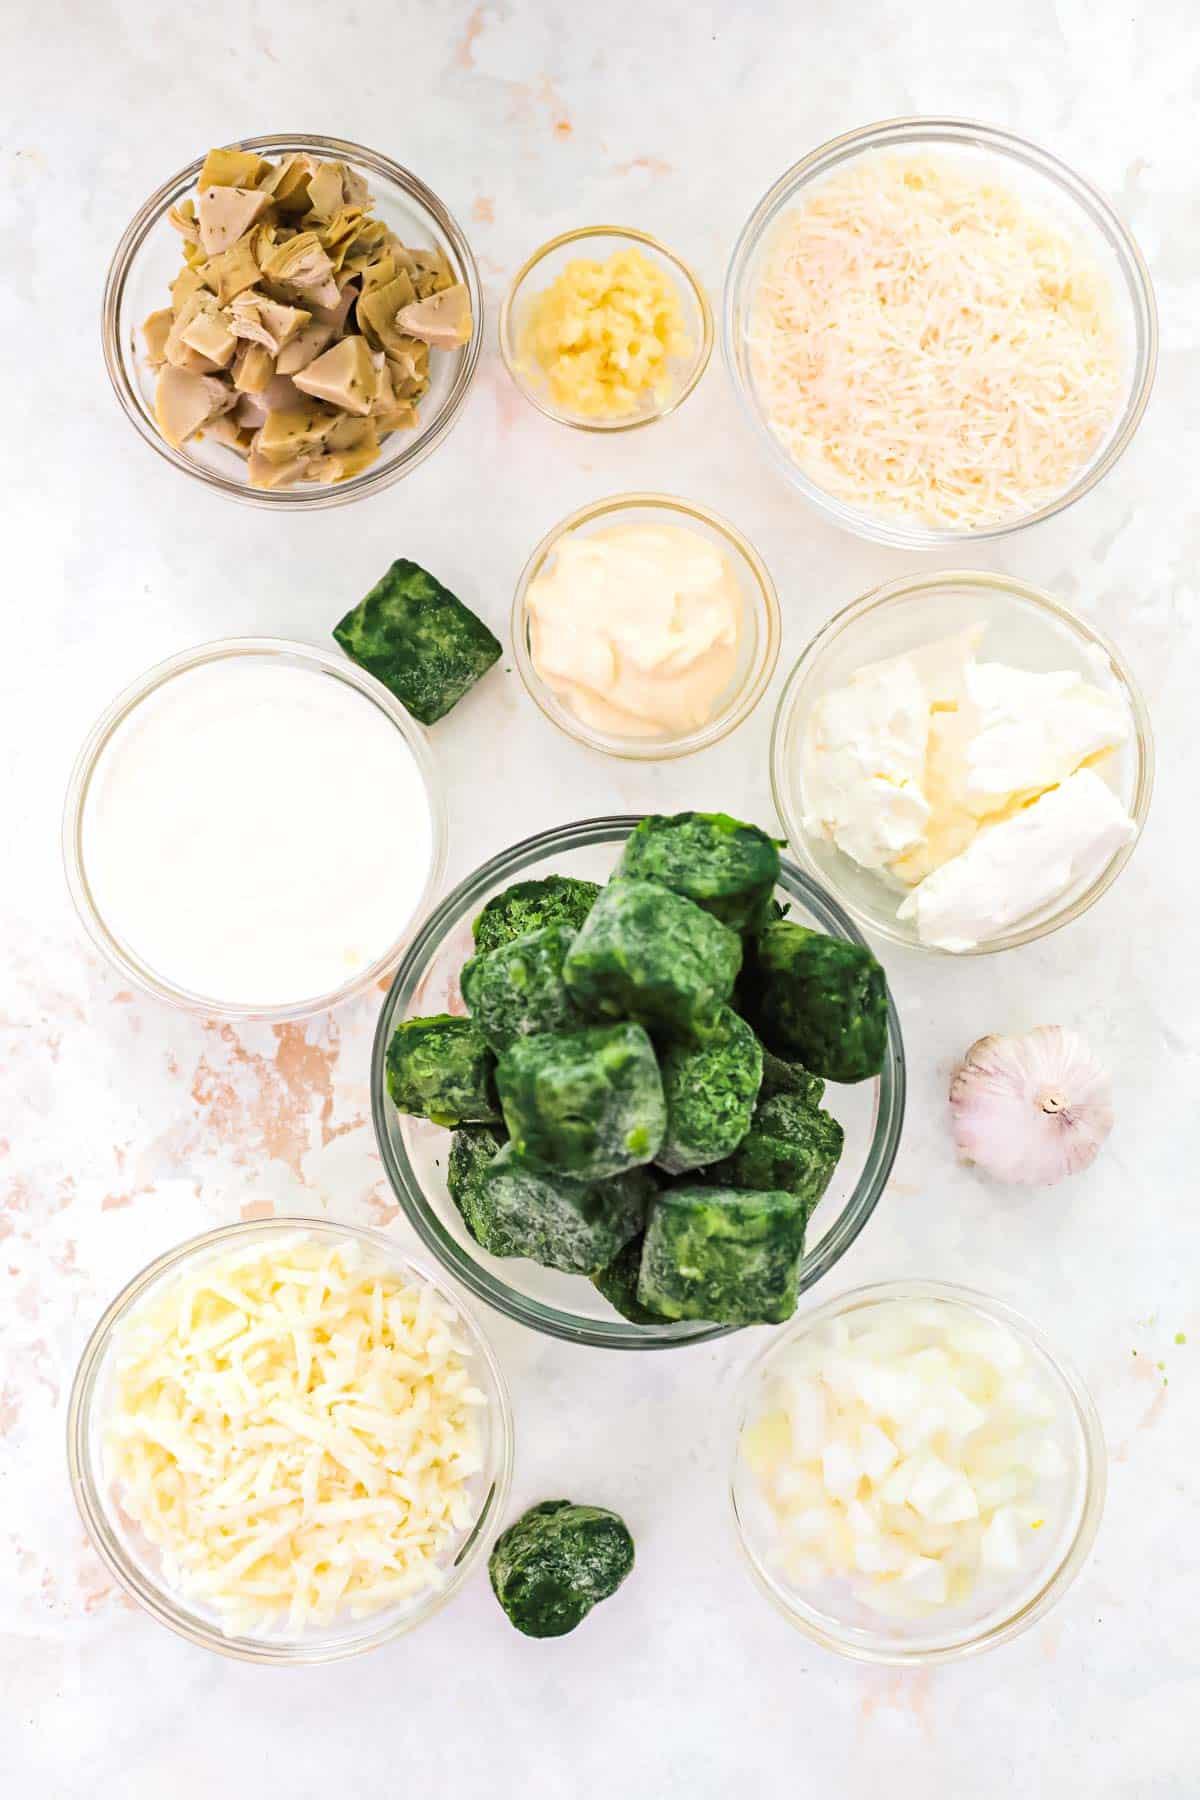 spinach artichoke ingredients in bowls